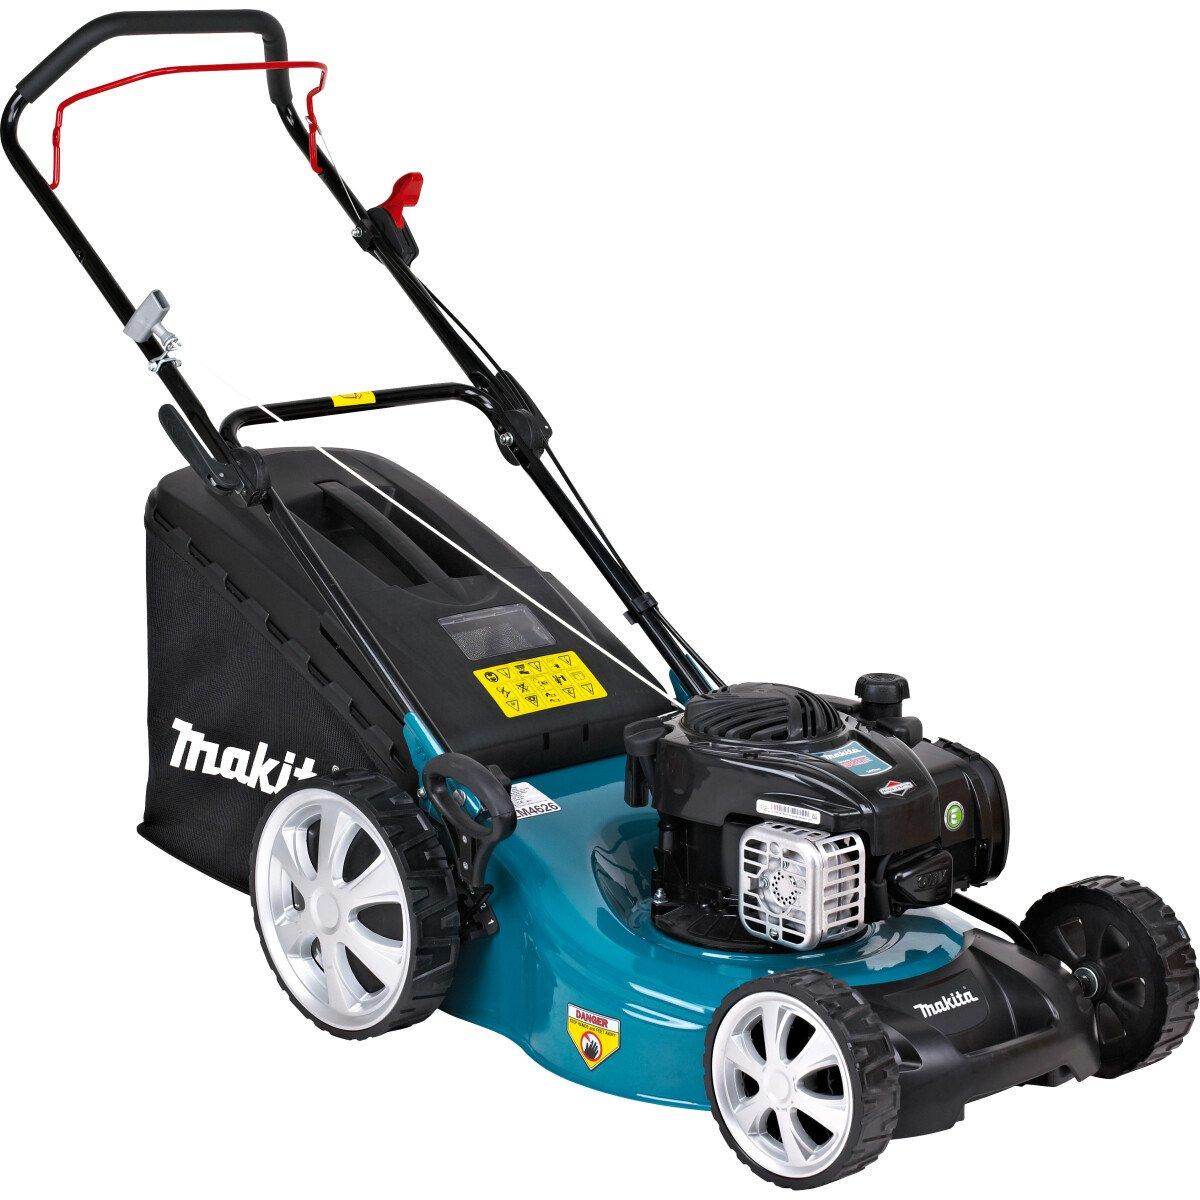 Makita PLM4626N 140cc 4-Stroke Petrol Lawn Mower